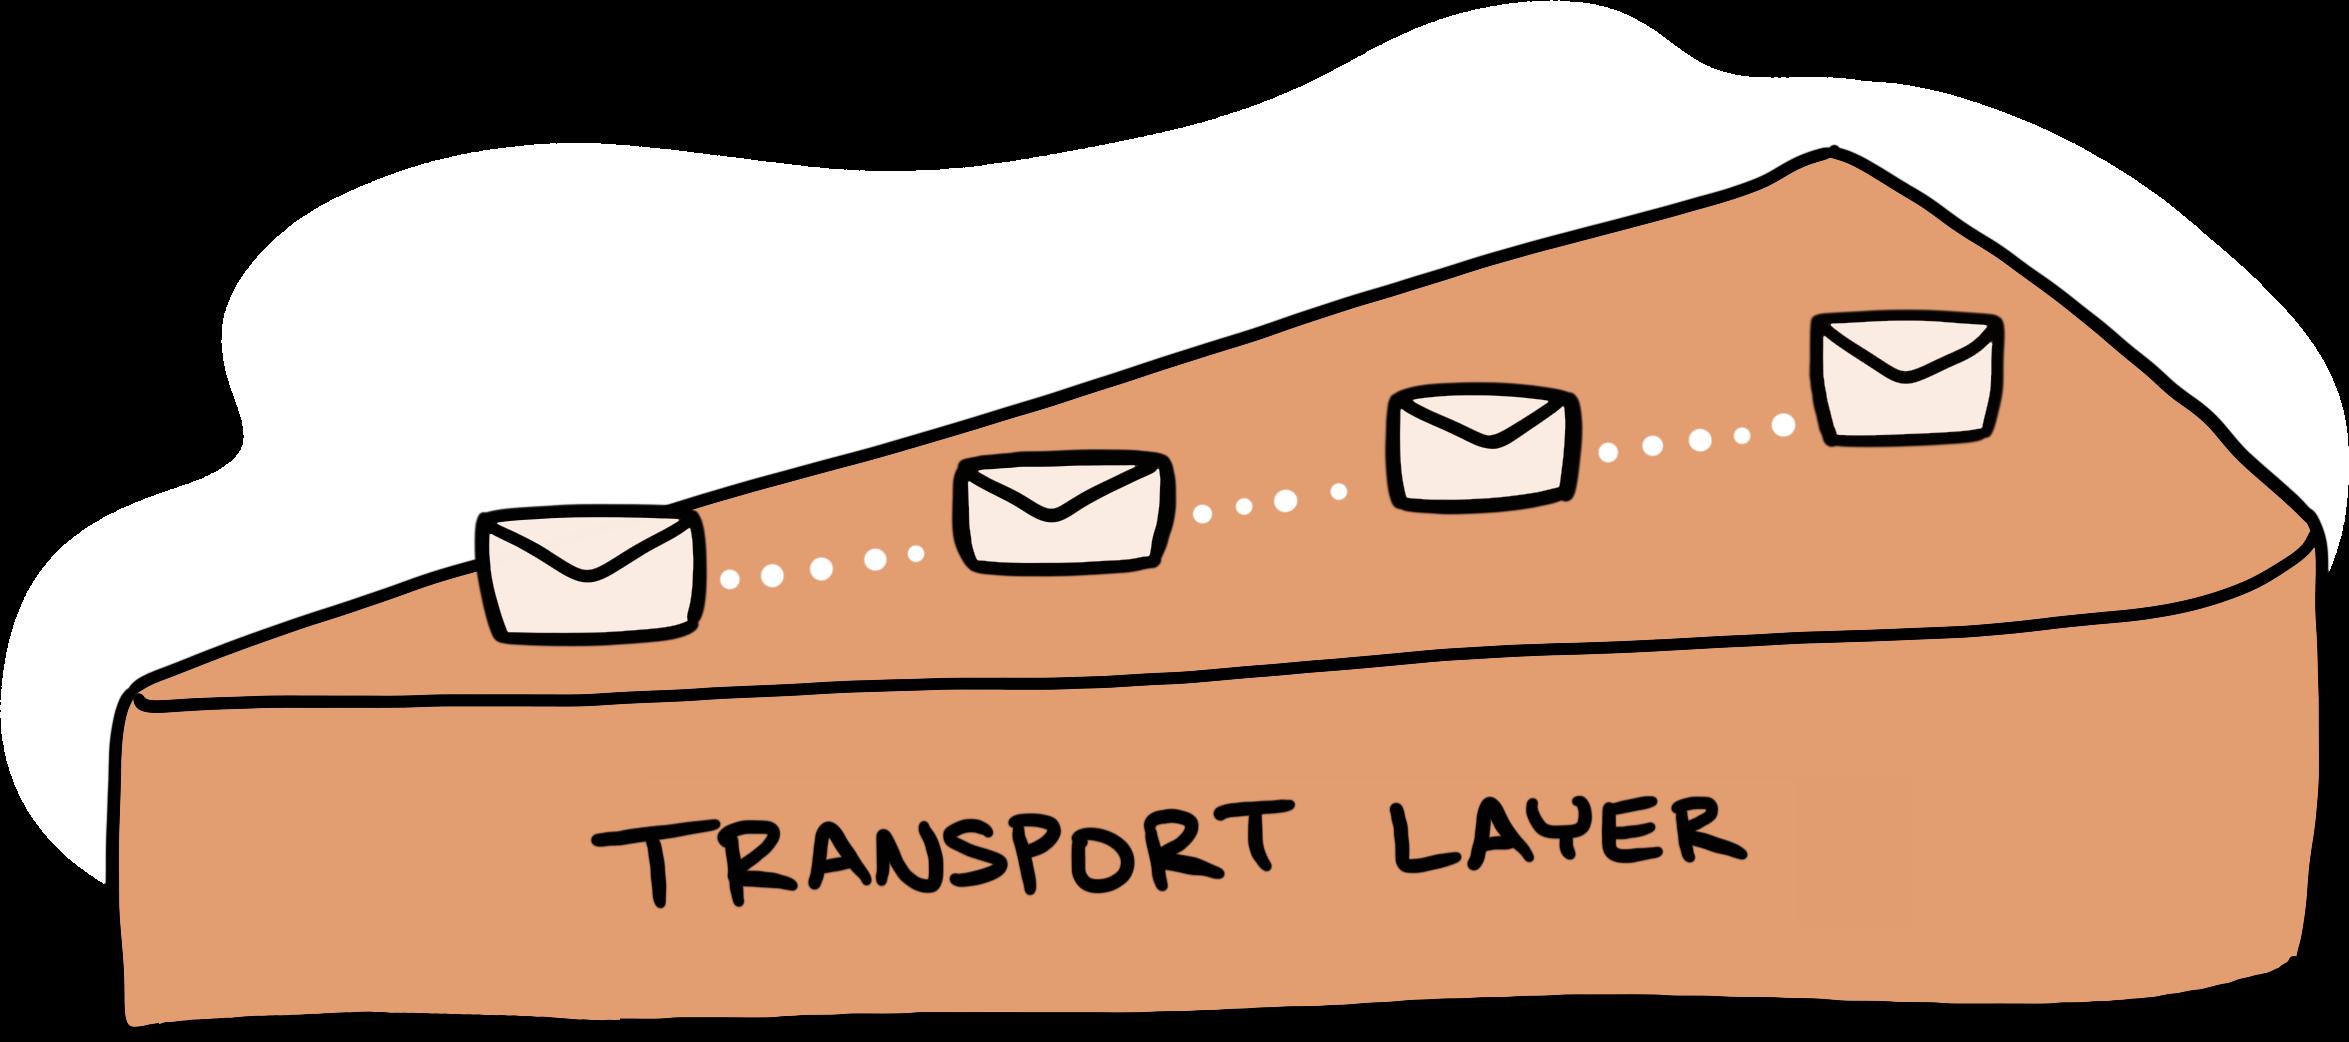 Transport cake layer cartoon